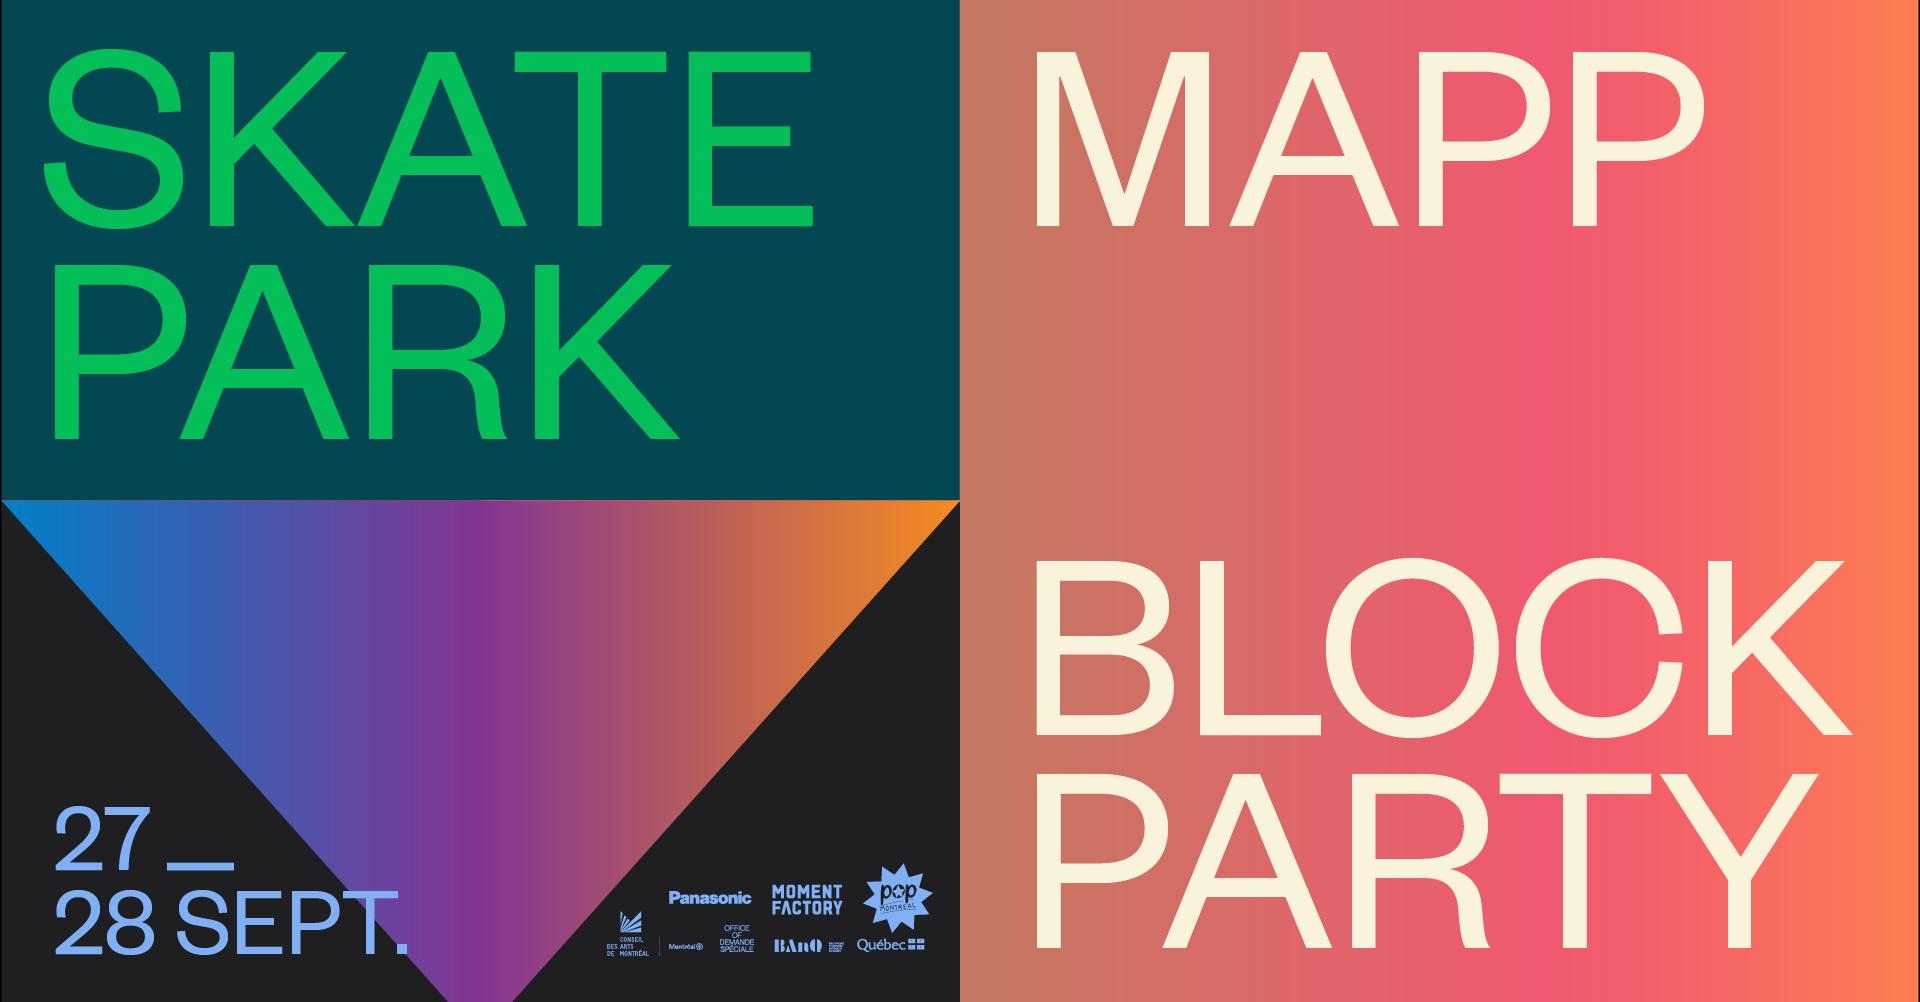 MAPP BLOCK PARTY